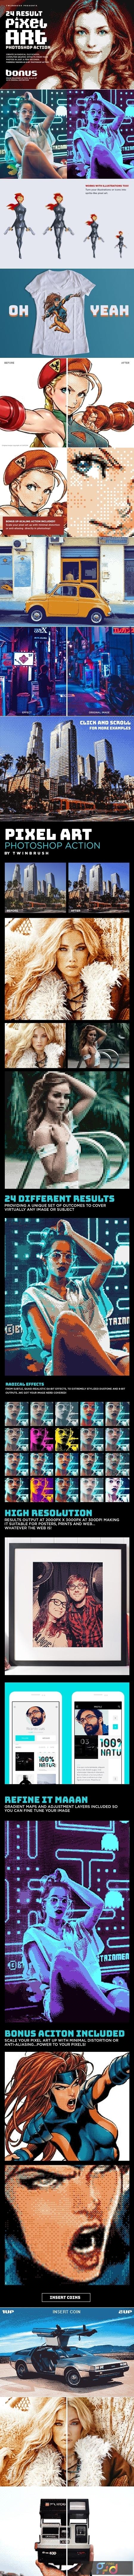 Pixel Art Photoshop Action 1353417 1